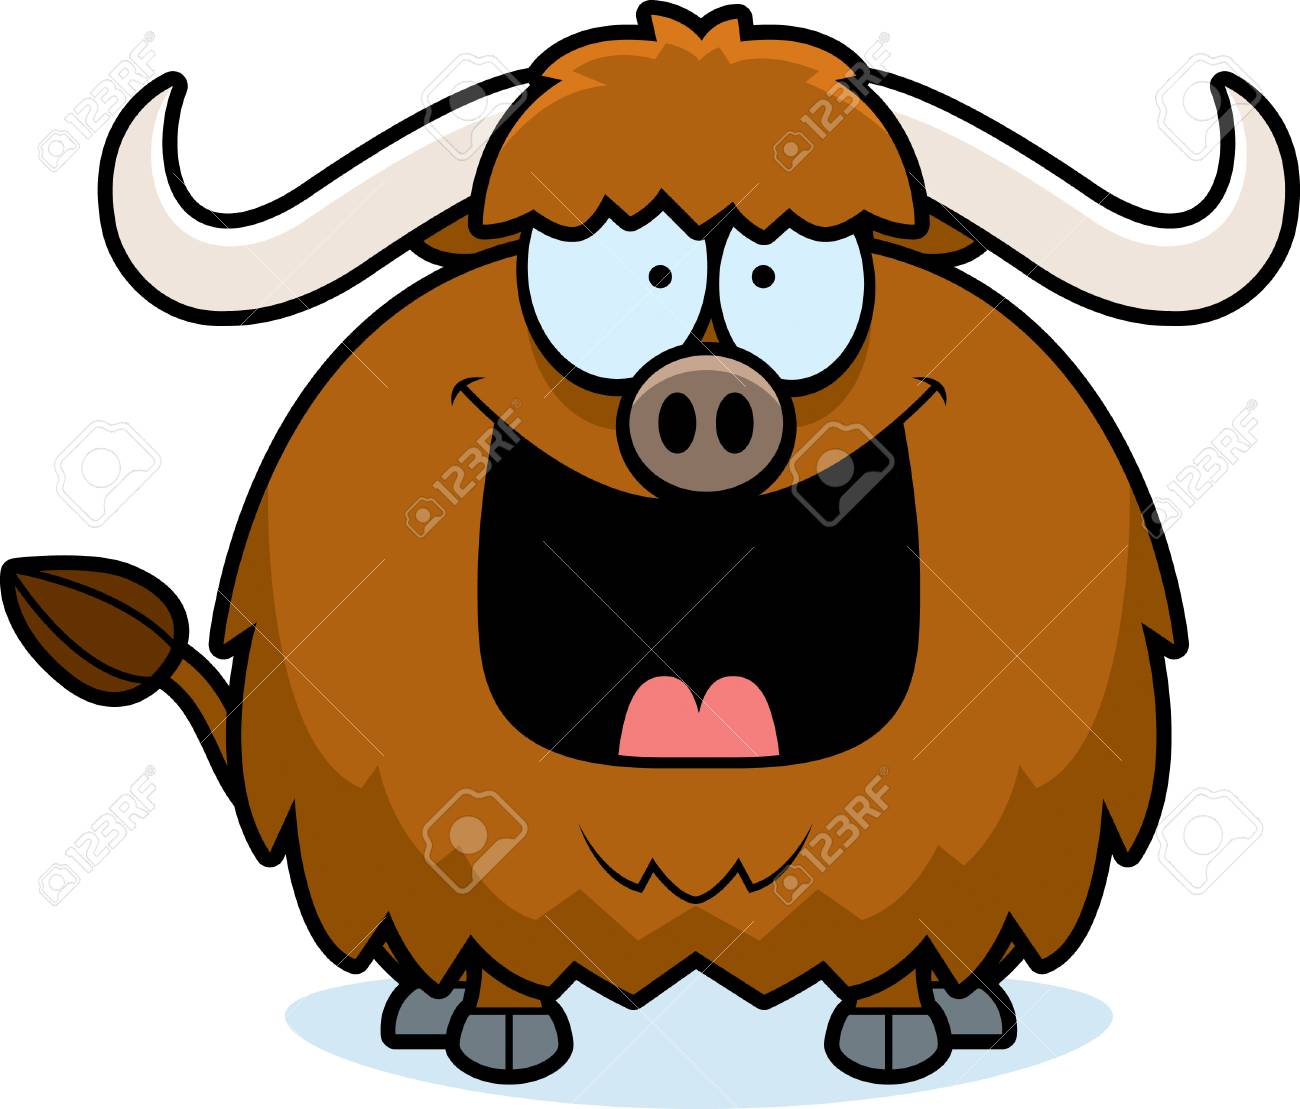 a cartoon illustration of a yak looking happy royalty free cliparts rh 123rf com yak clipart free Cartoon Yak